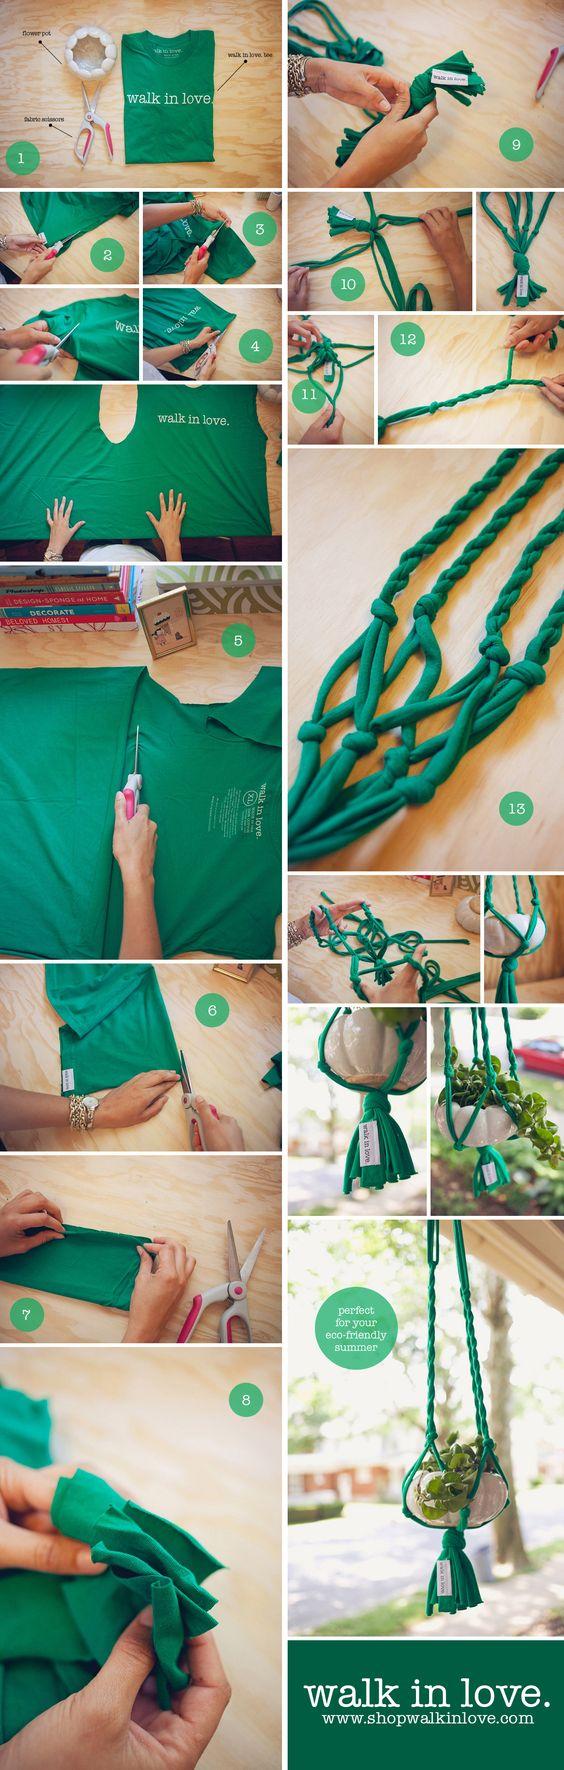 Sacar trapillo de una camiseta y tejer en macramè un colgante para macetero. DIY T-shirt plant hanger. See full instructions here : http://shopwalkinlove.com/t-shirt-plant-hanger-diy/